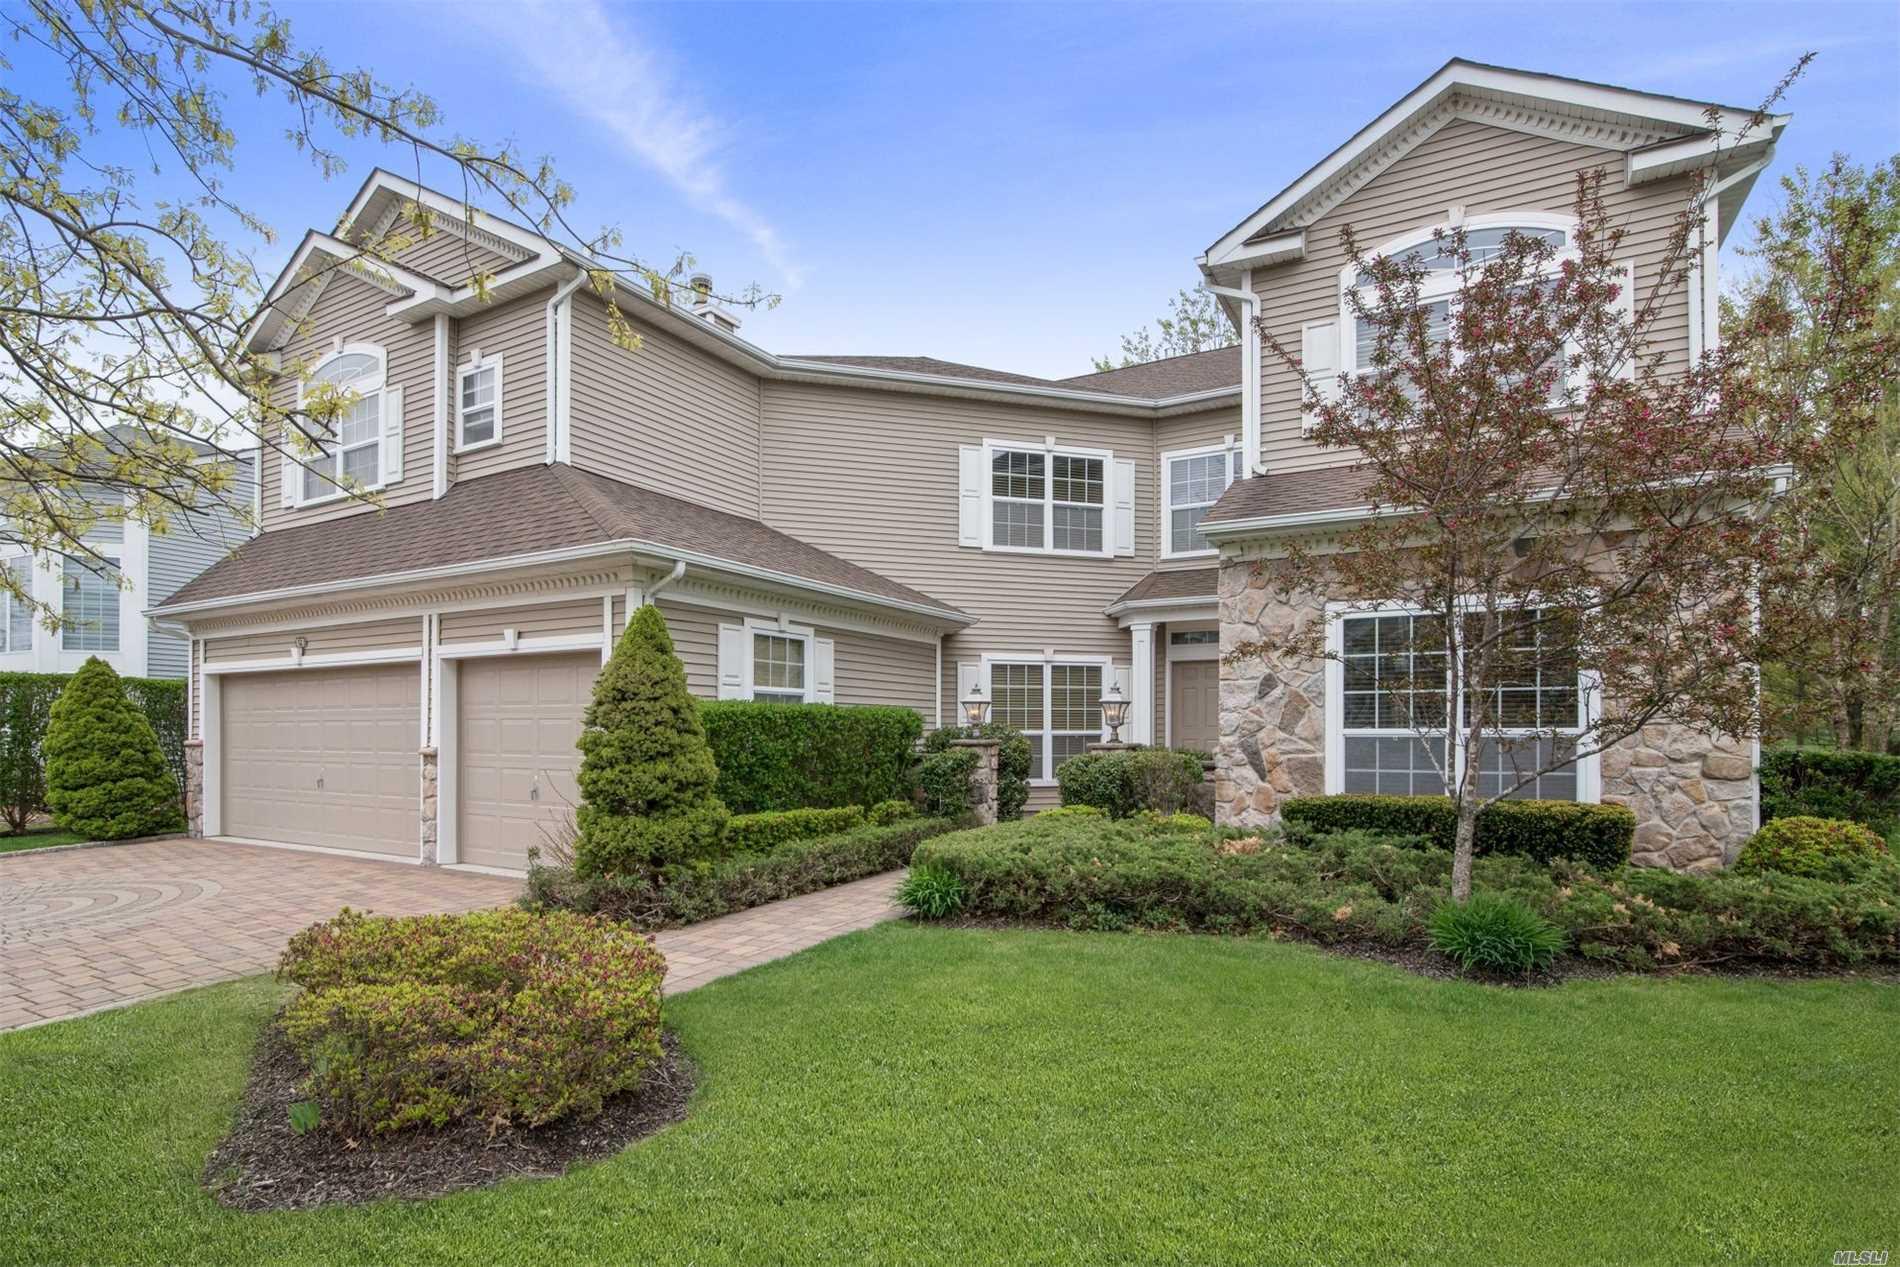 Property for sale at 52 Hamlet Drive, Mt. Sinai NY 11766, Mt. Sinai,  New York 11766